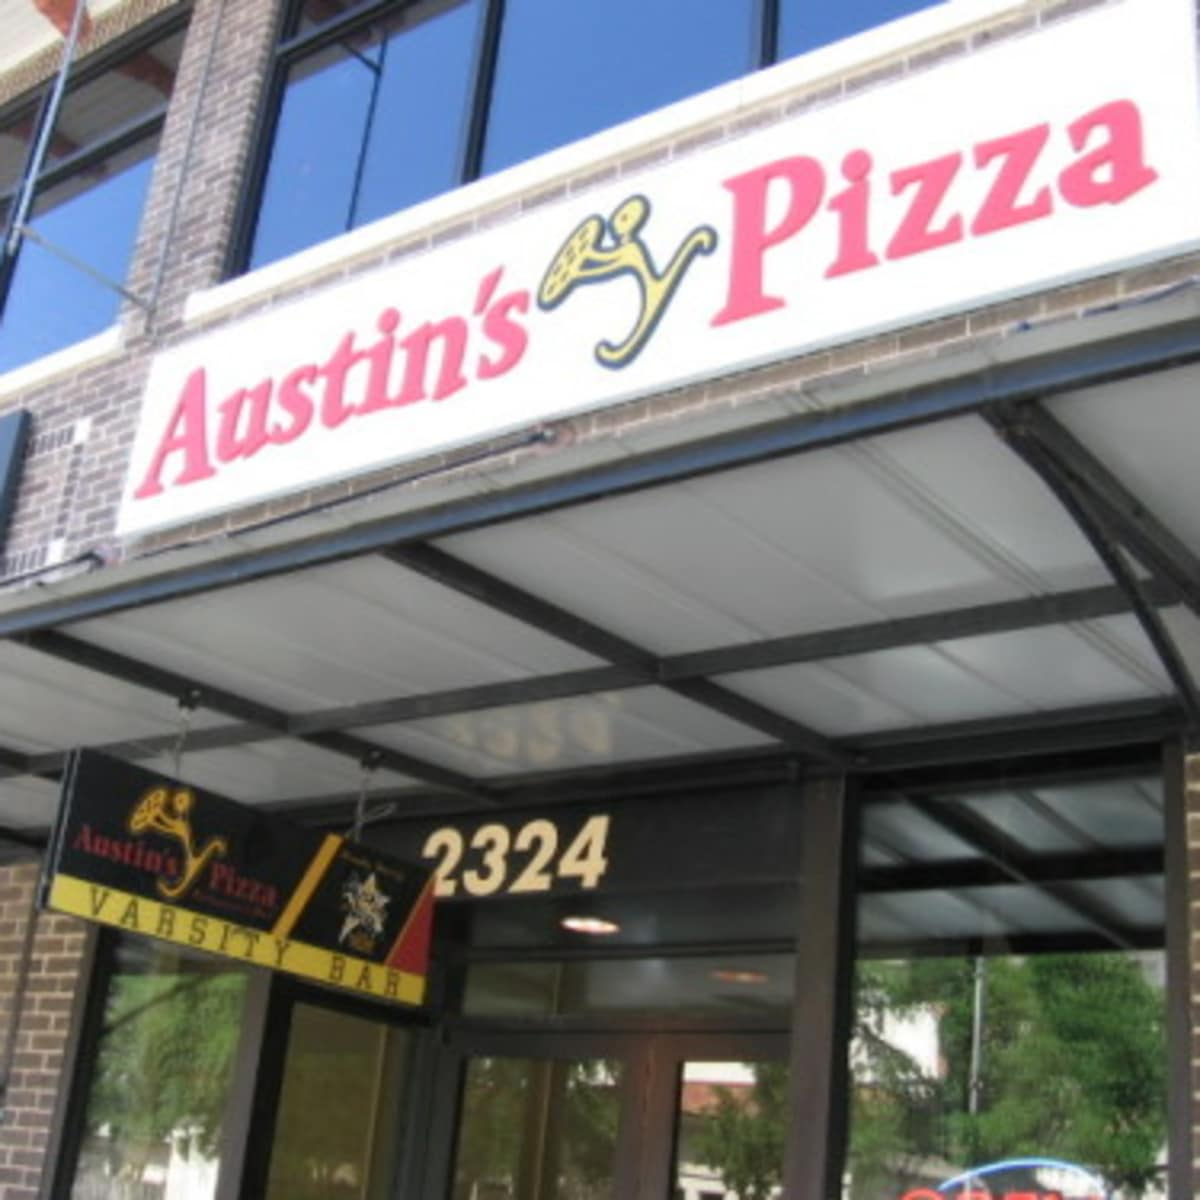 Austin_photo: places_food_austinspizza_guadalupe_exterior